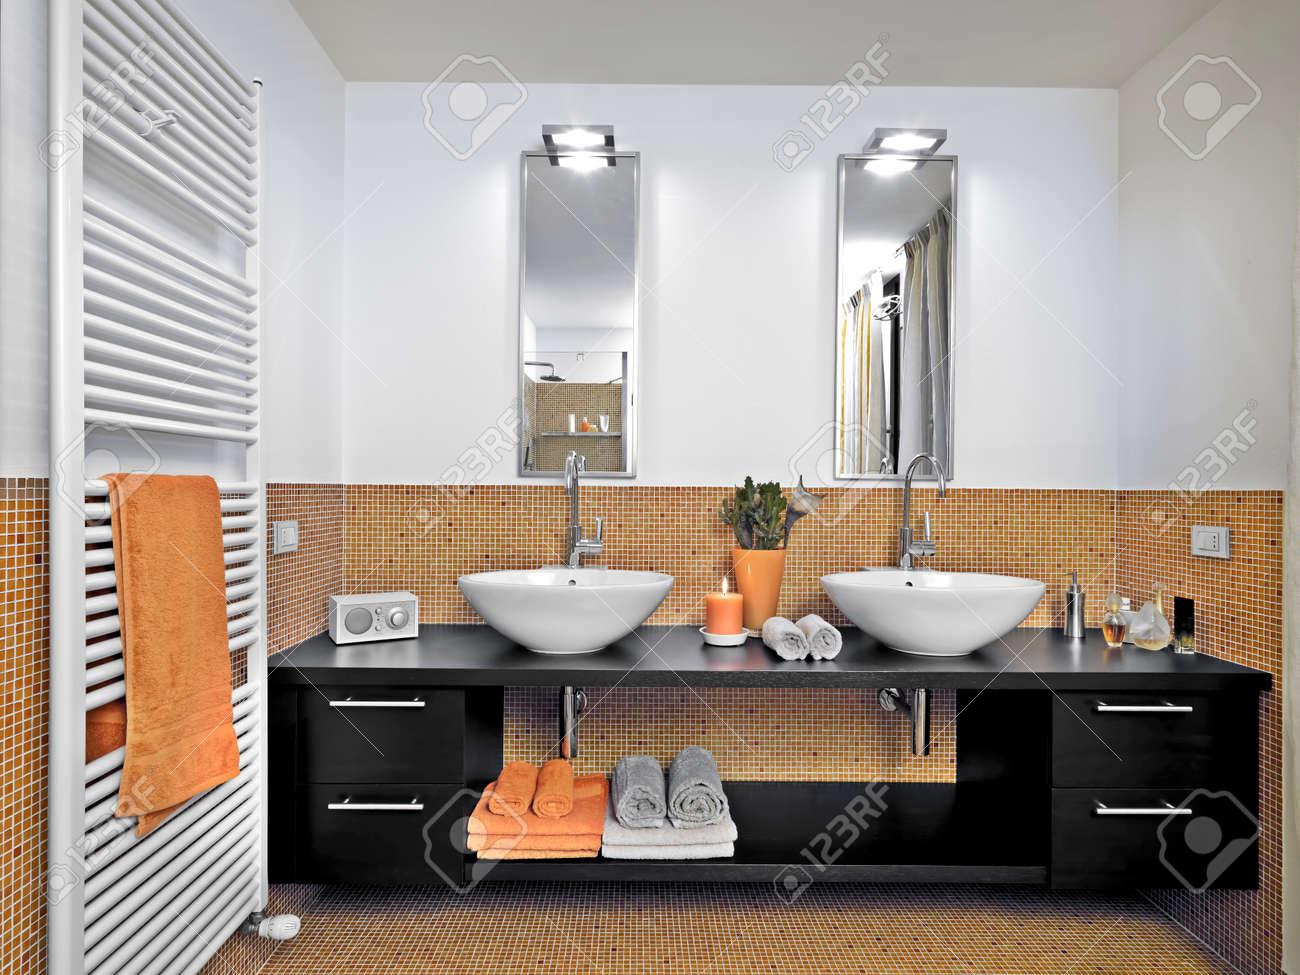 bagni in muratura mosaico. great lavandino bagno in muratura ... - Immagini Bagni In Muratura Moderni